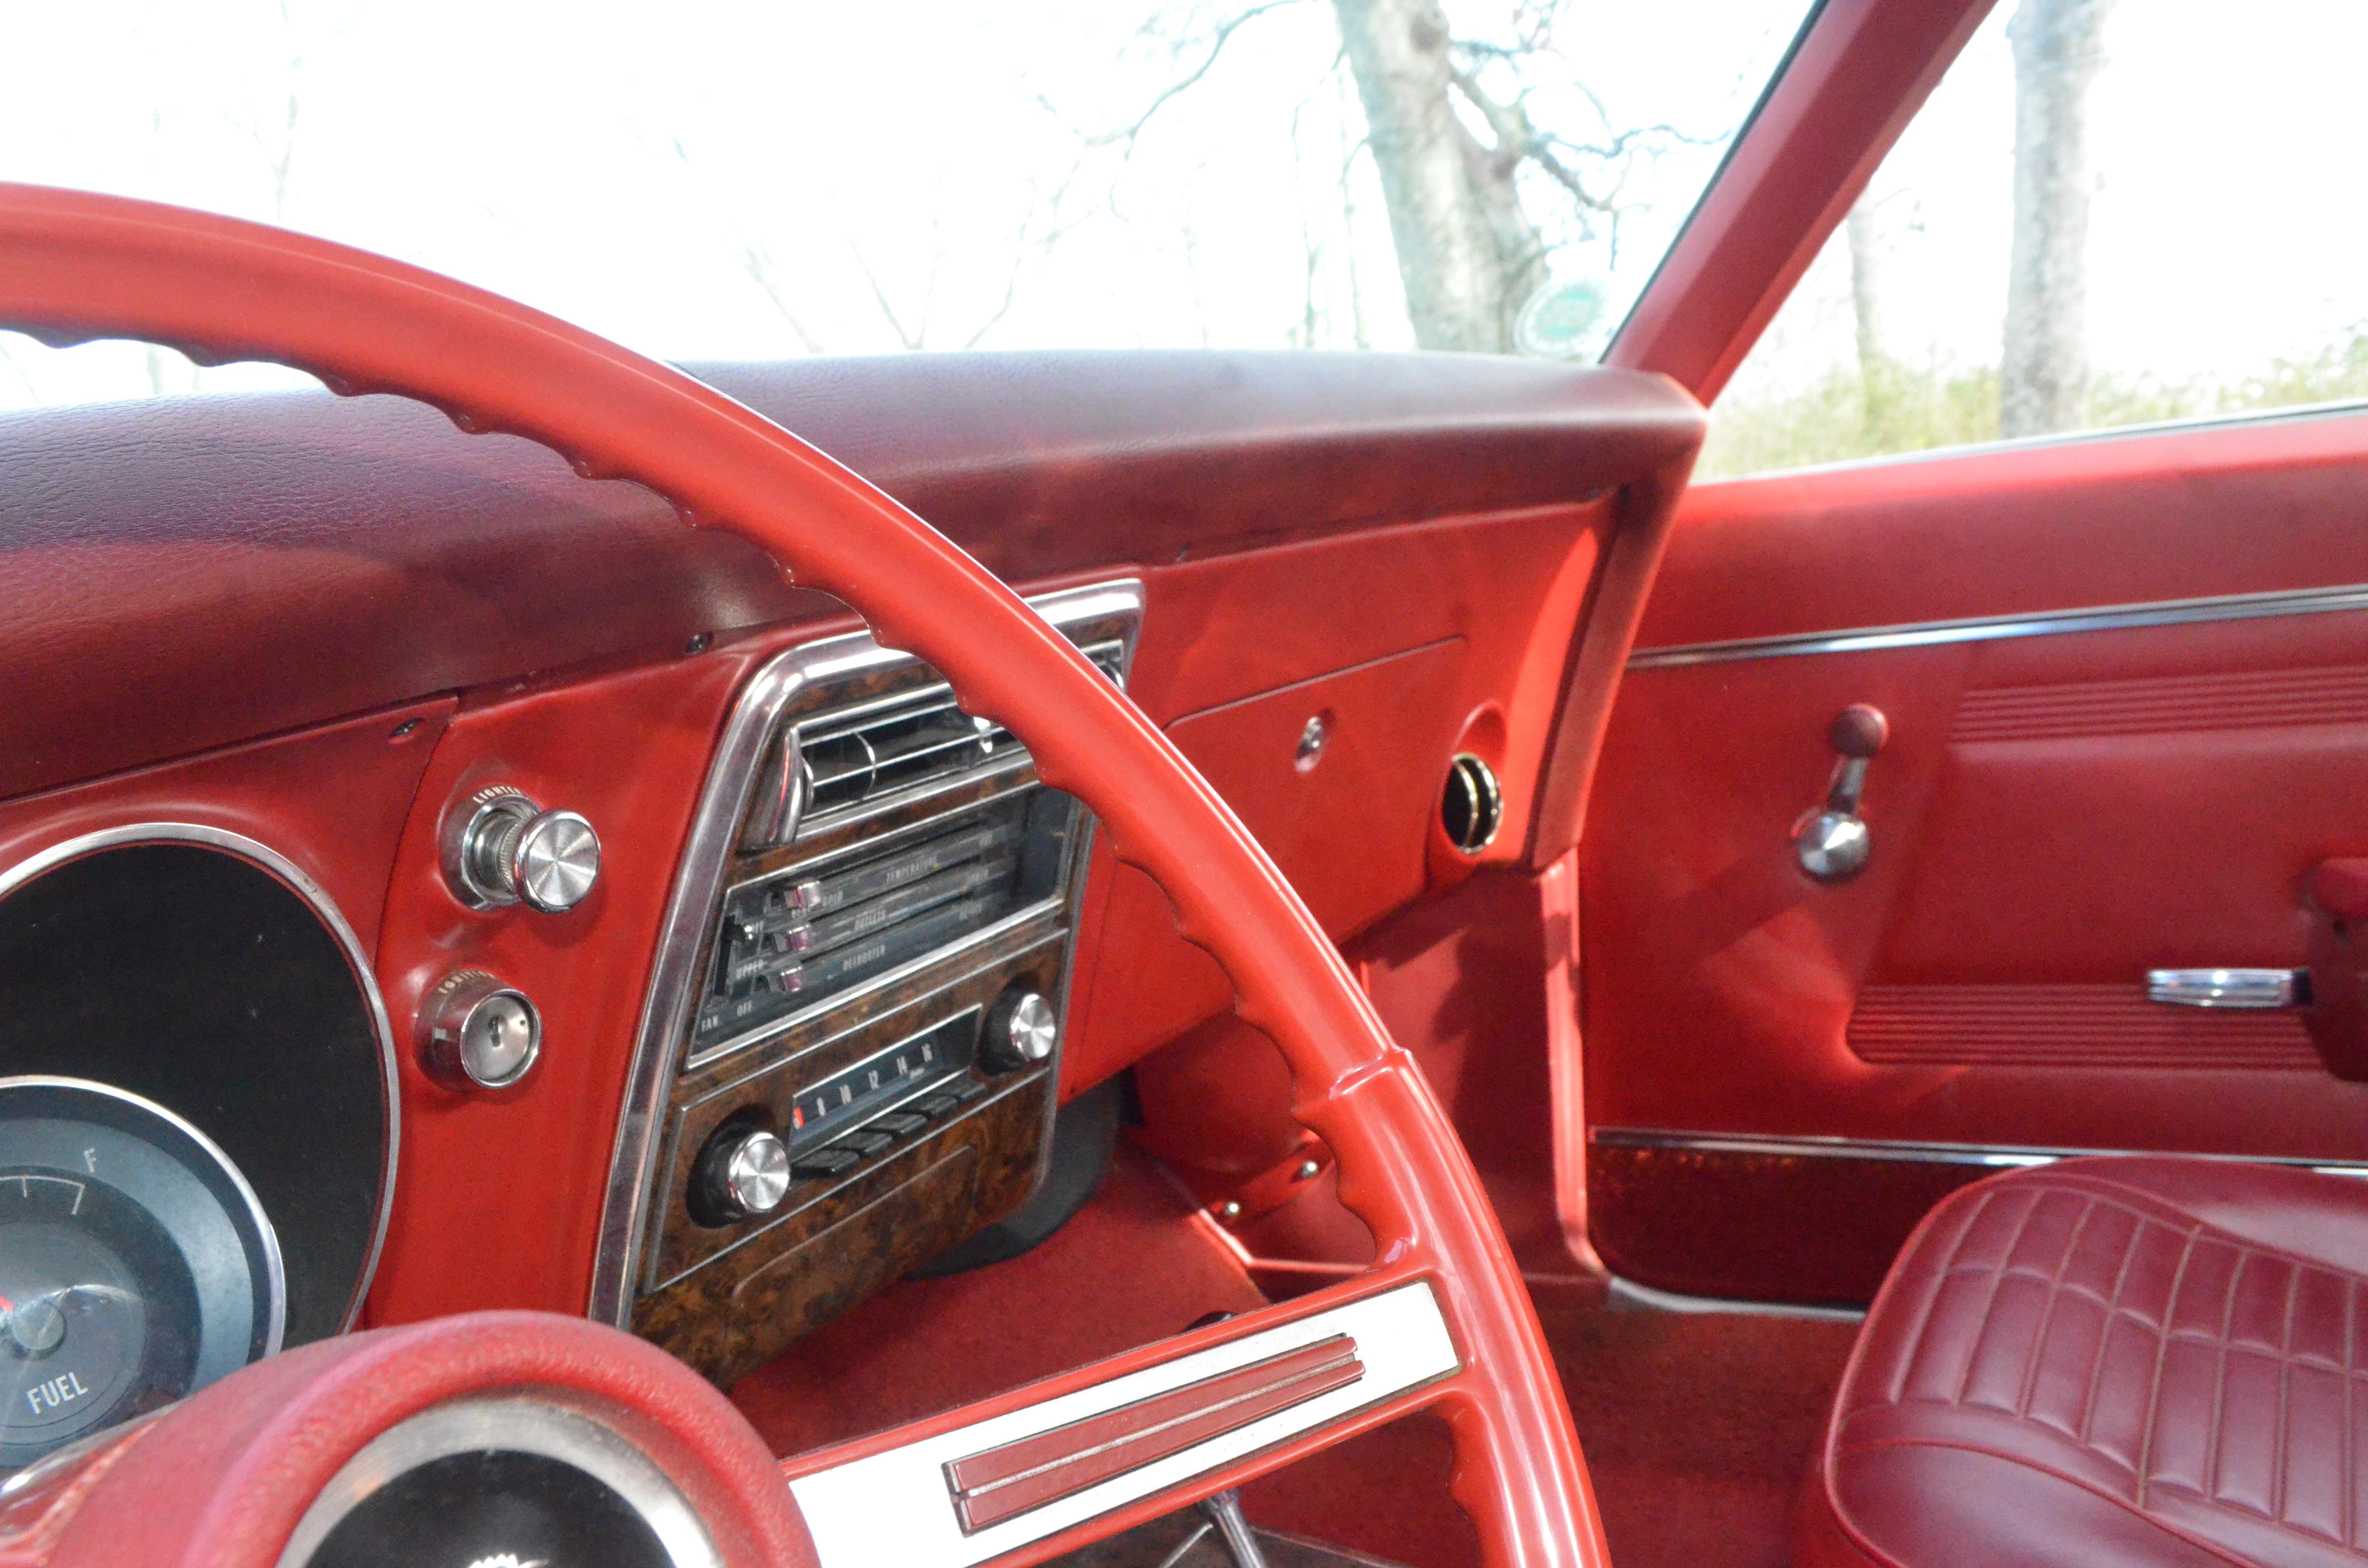 Classic firebird dash